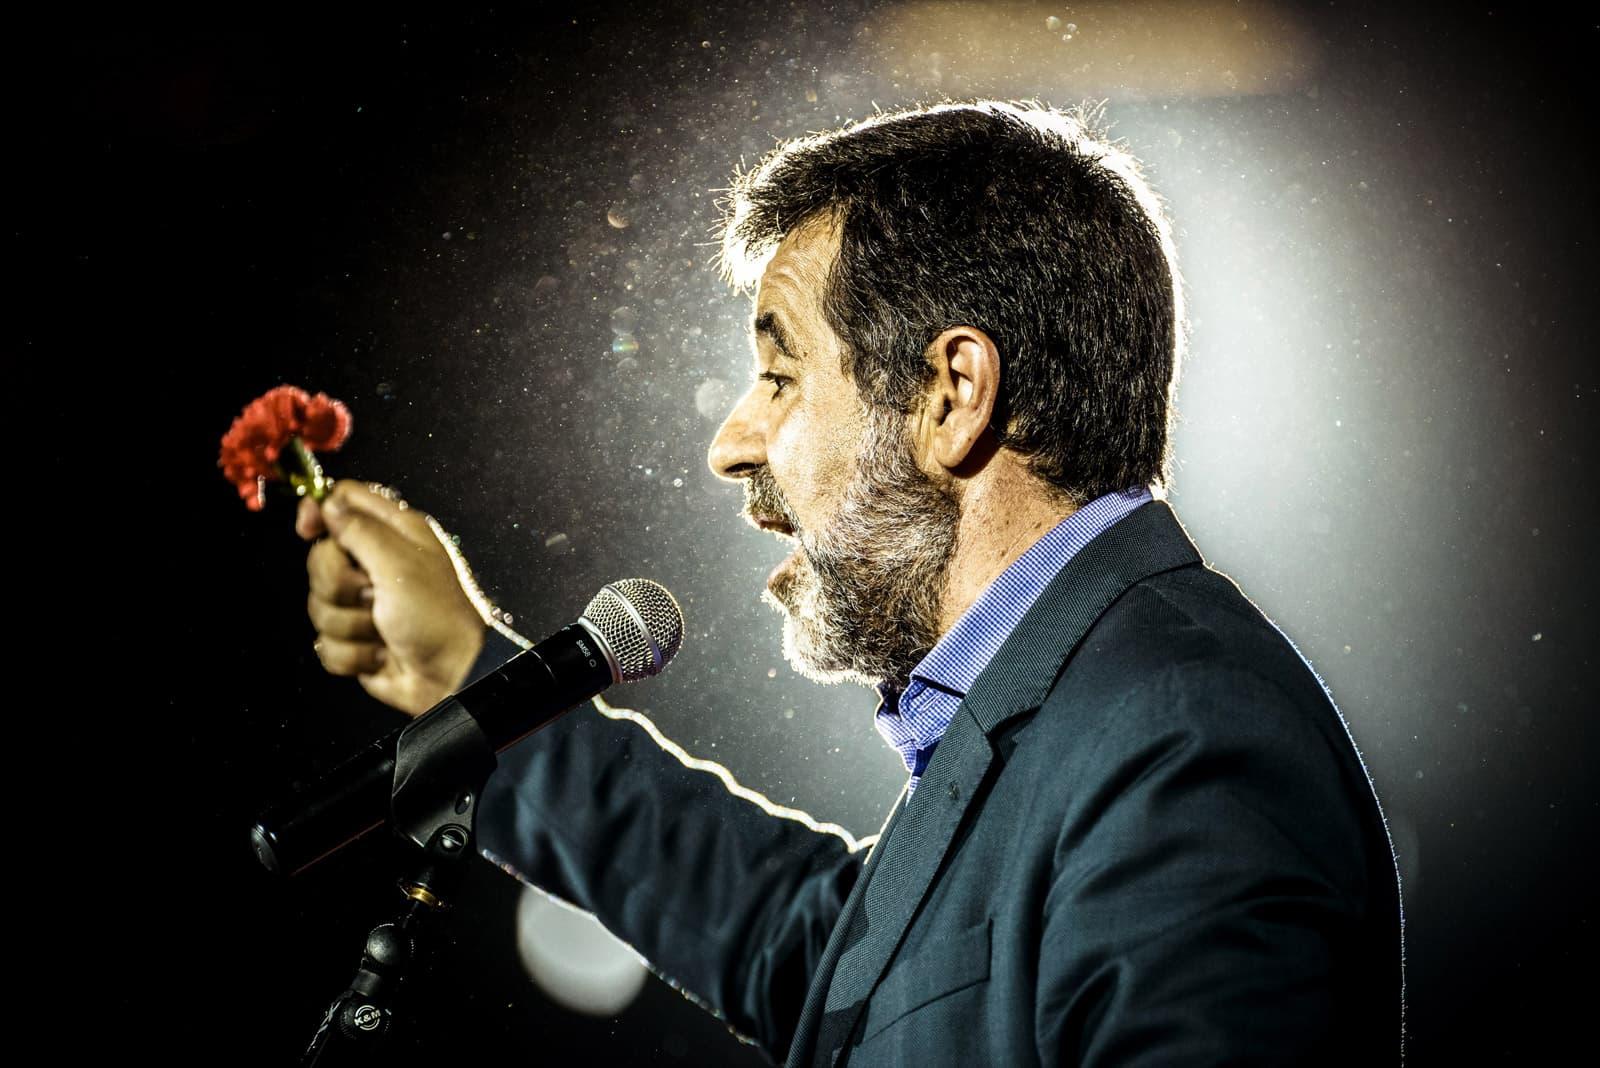 Jordi Sànchez en un acte de campanya de setembre del 2017. Fotografia de Matthias Oesterle. Zuma Wire.